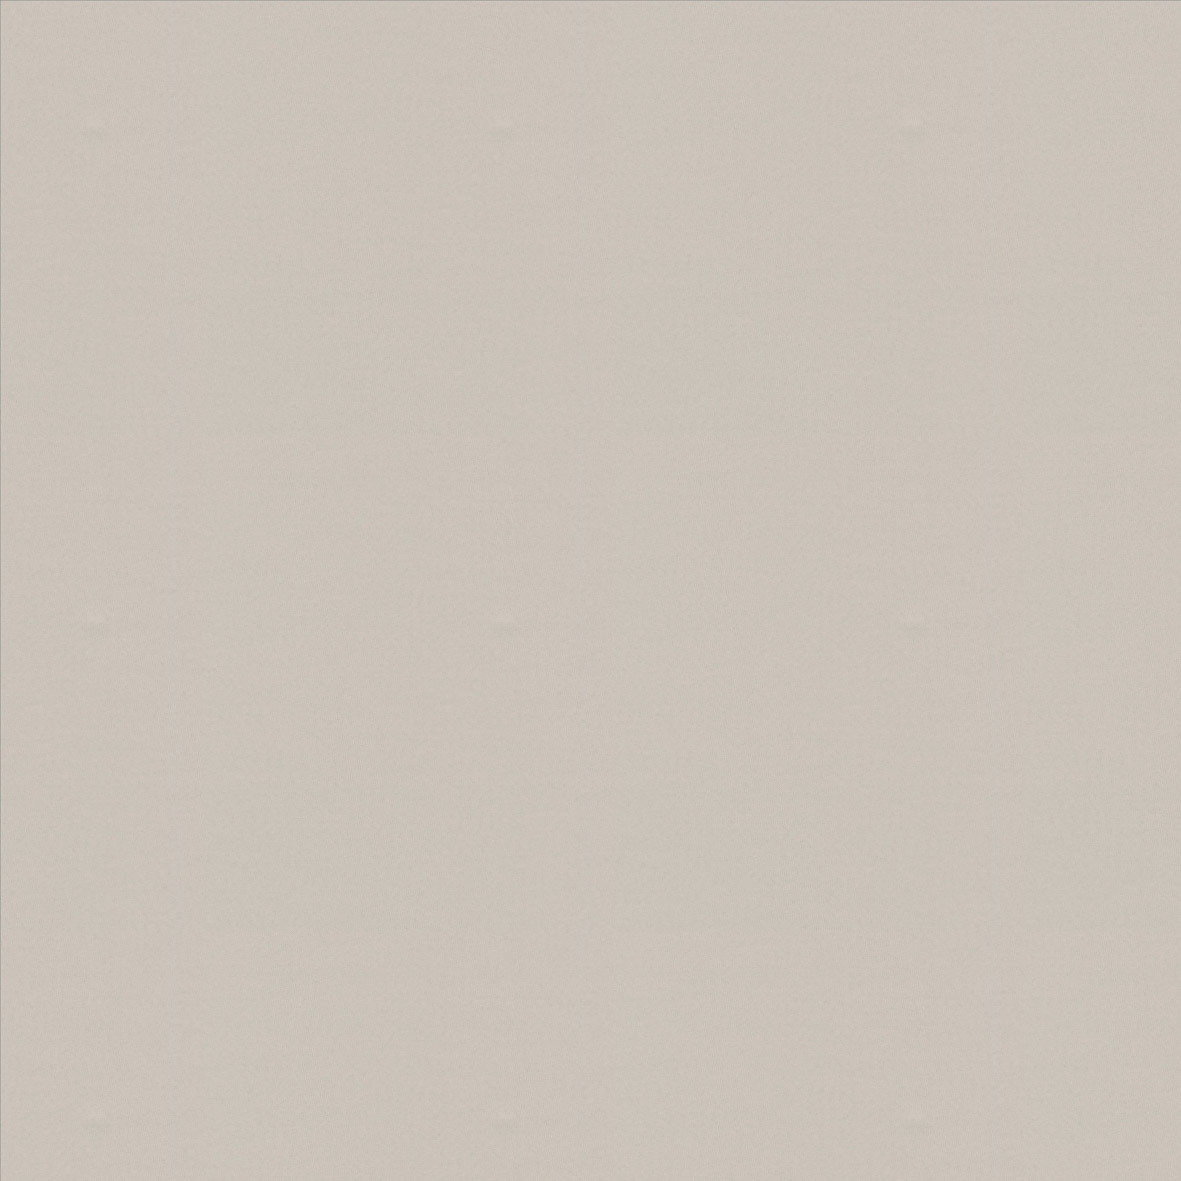 Roller_Swatch_Palette_Stone Grey_RE0070